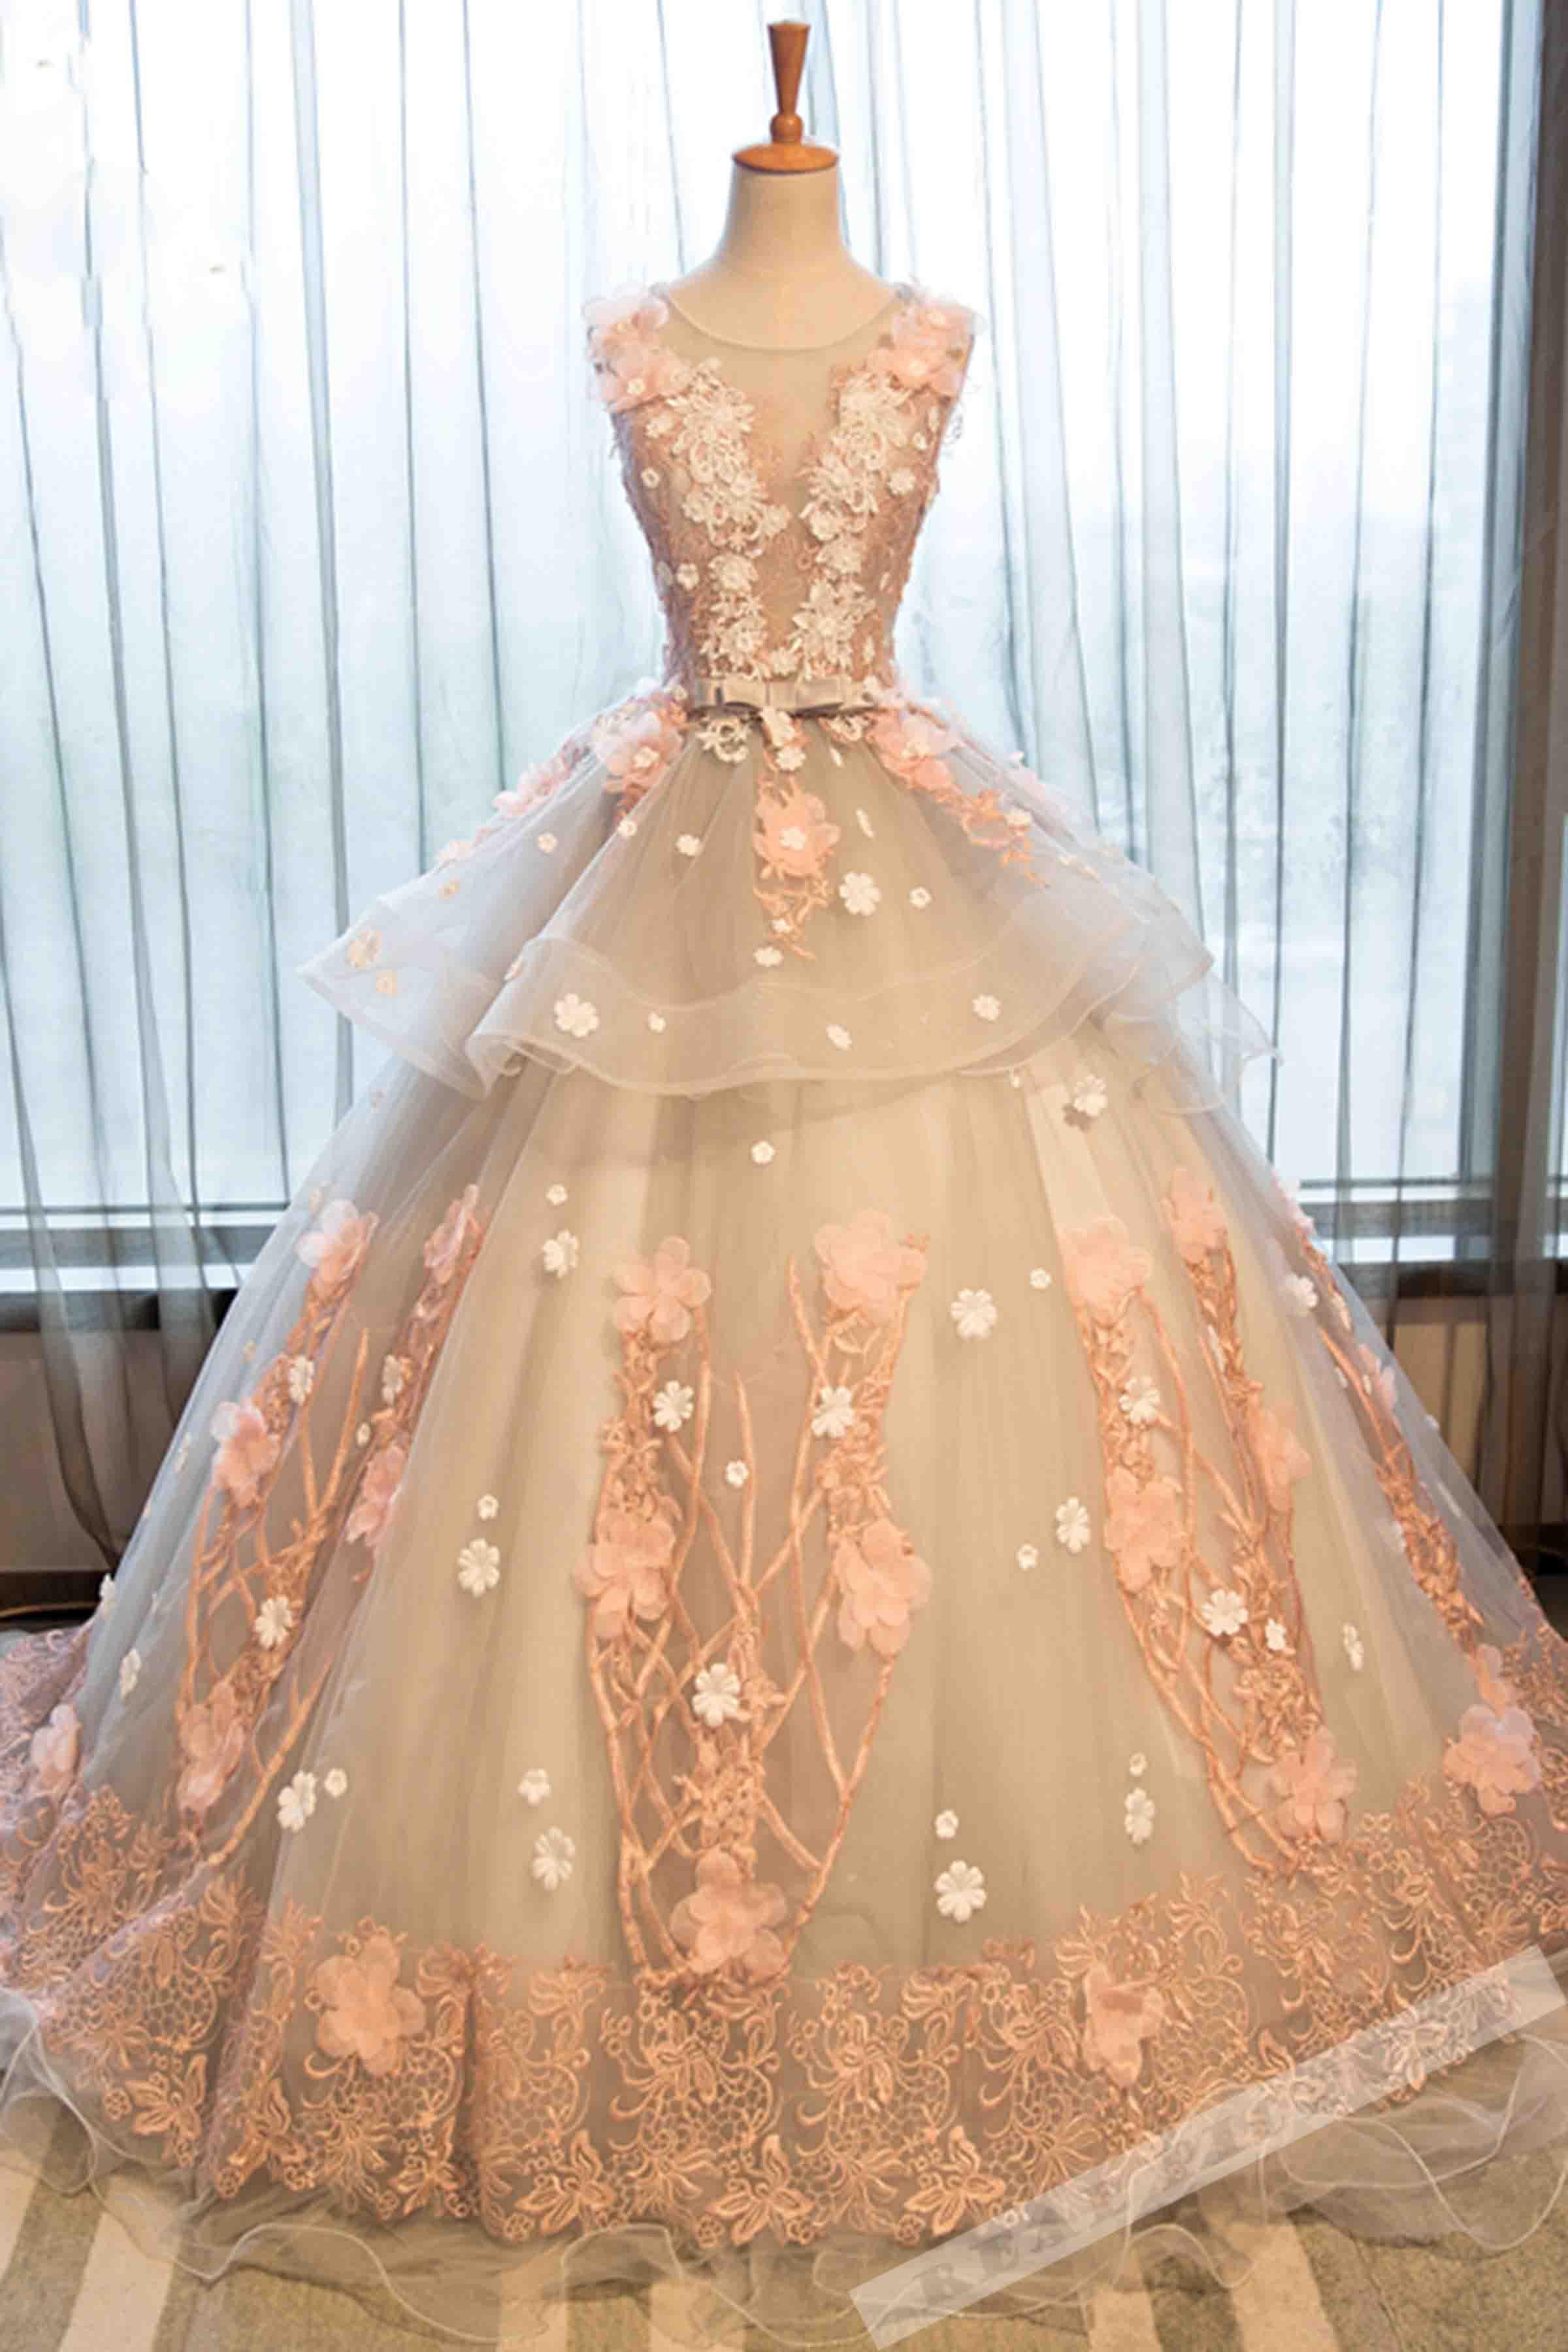 Champagne organza lace applique round neck handmade prom dress,ball ...